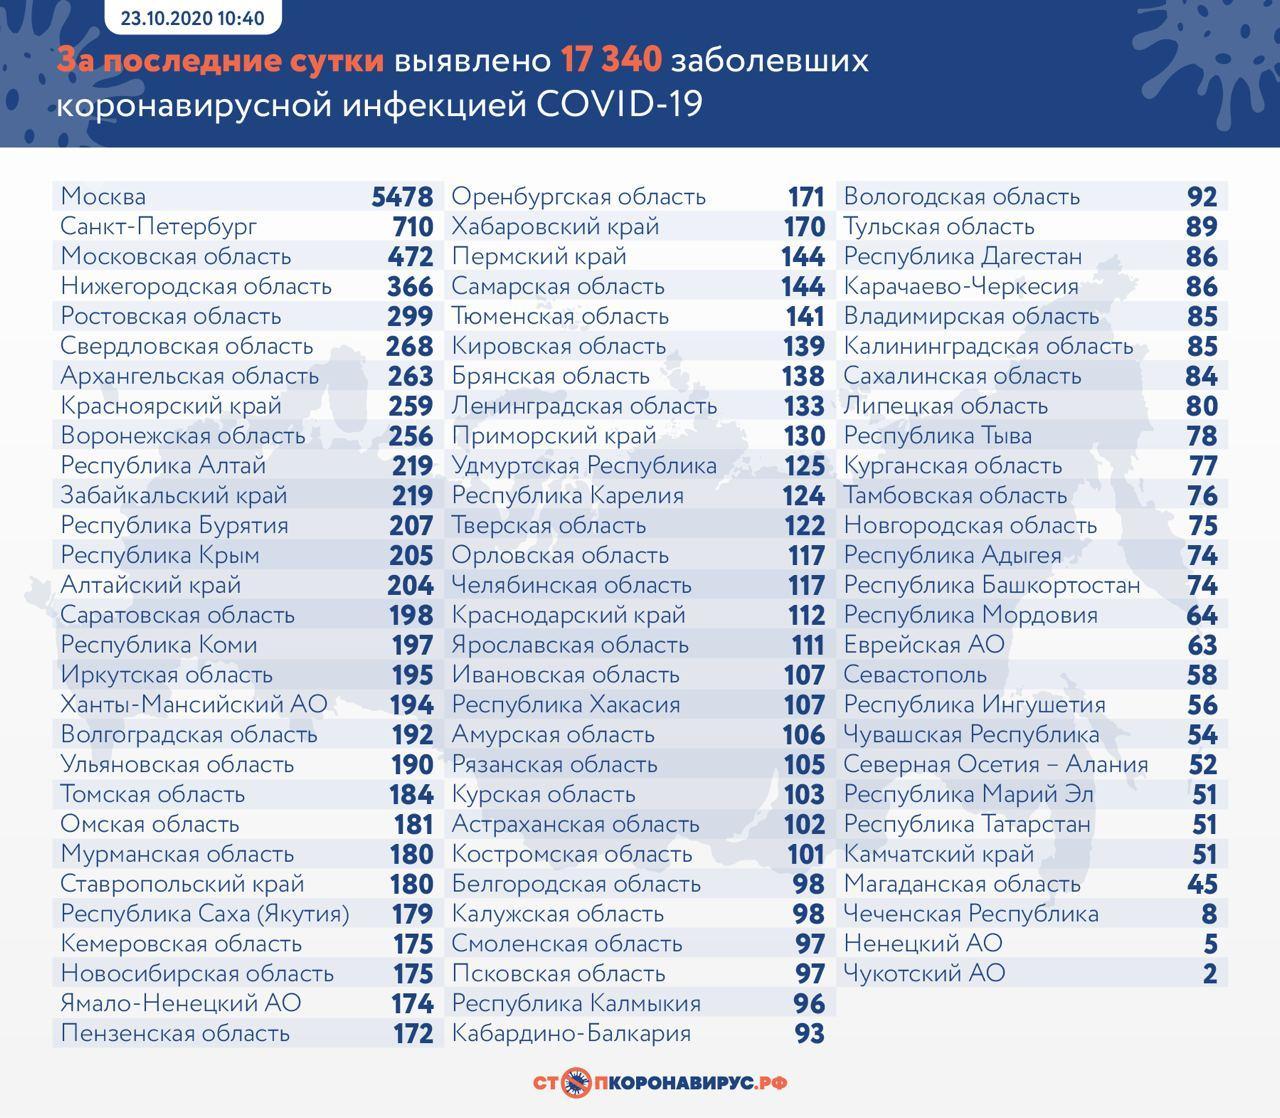 Россия обновила антирекорд по числу заболевших коронавирусом за сутки